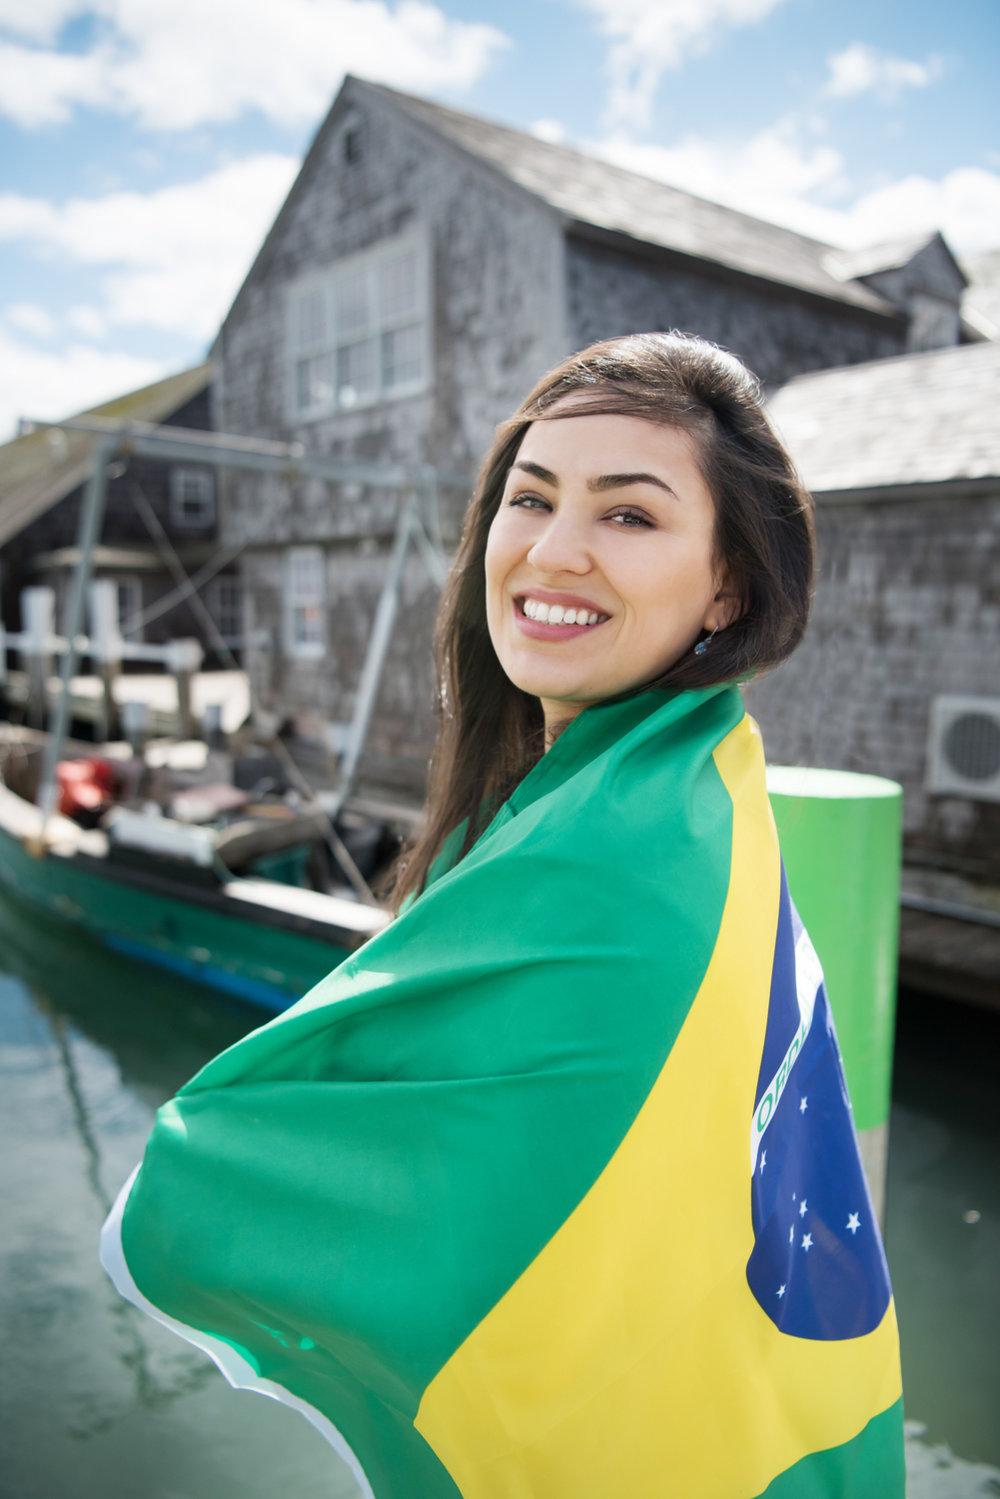 GISLAINE - BRAZIL